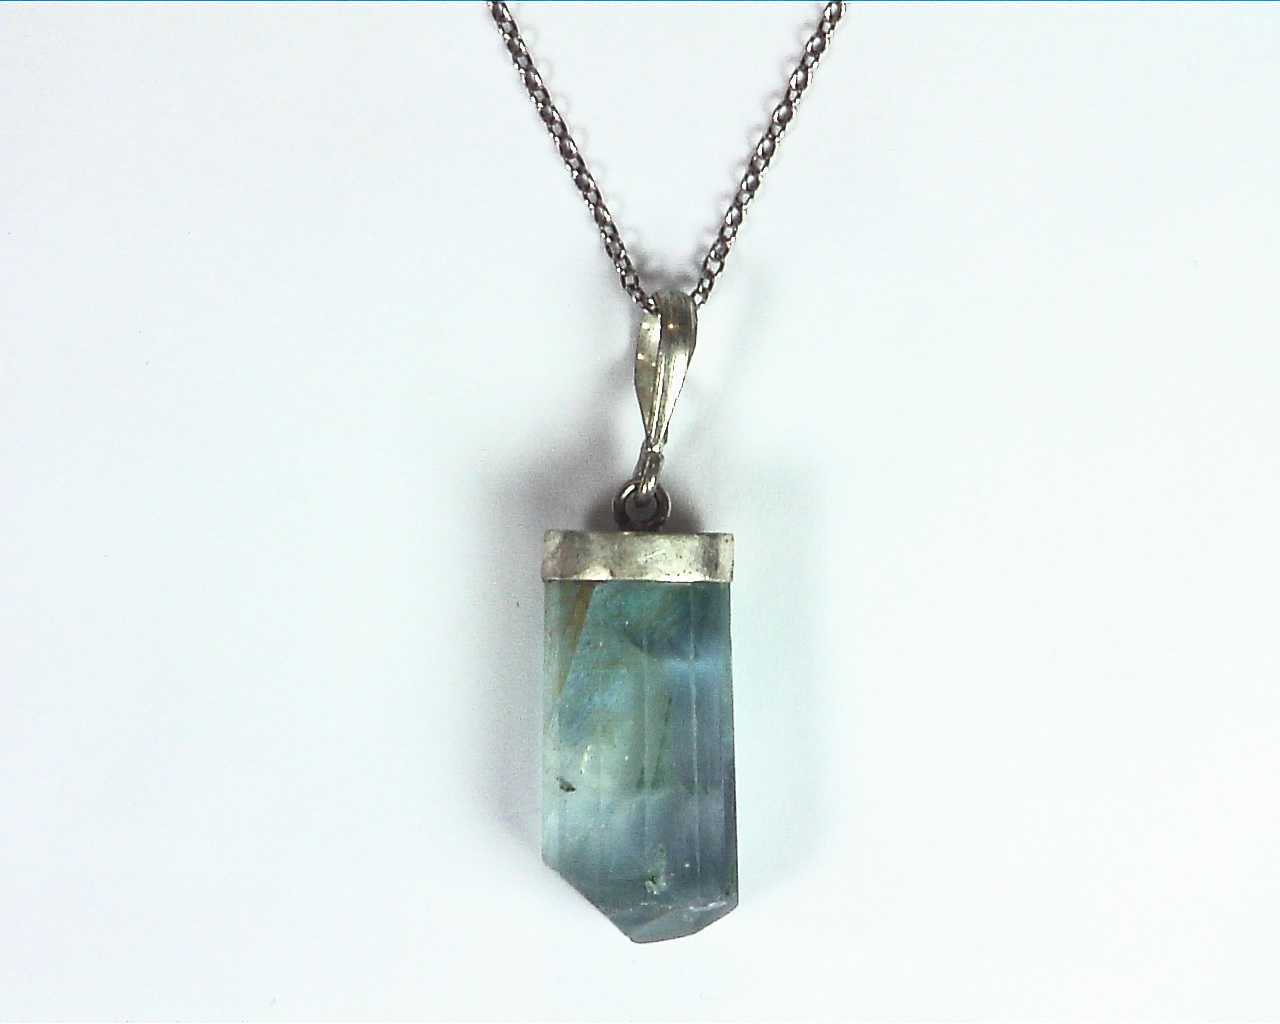 Fluorite Natural Genuine Gemstone Crystal Sterling Silver Pendent PSS,983 1